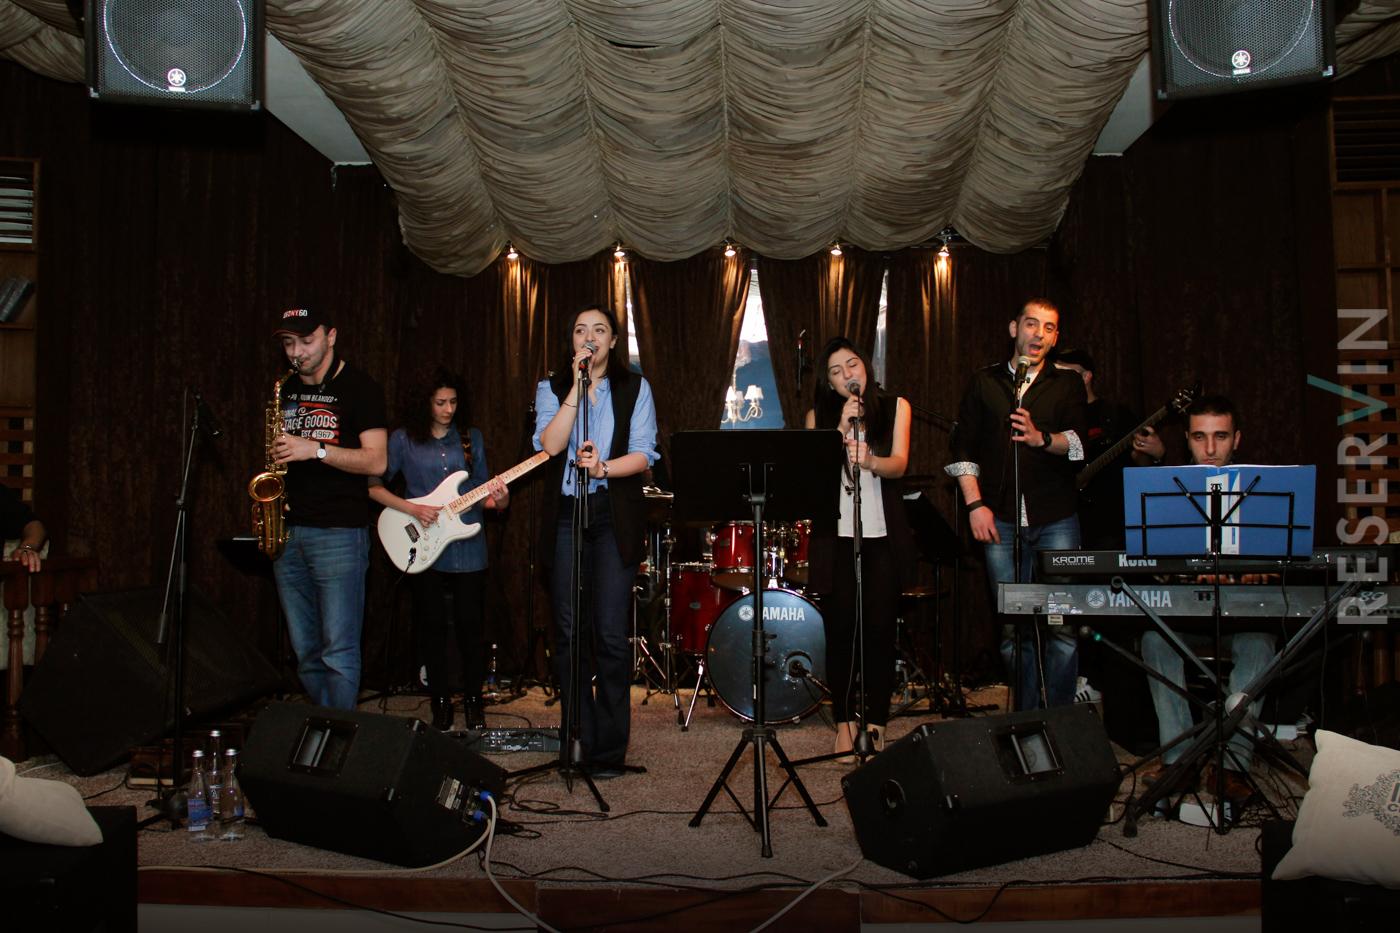 Club 12 Project 12 concert